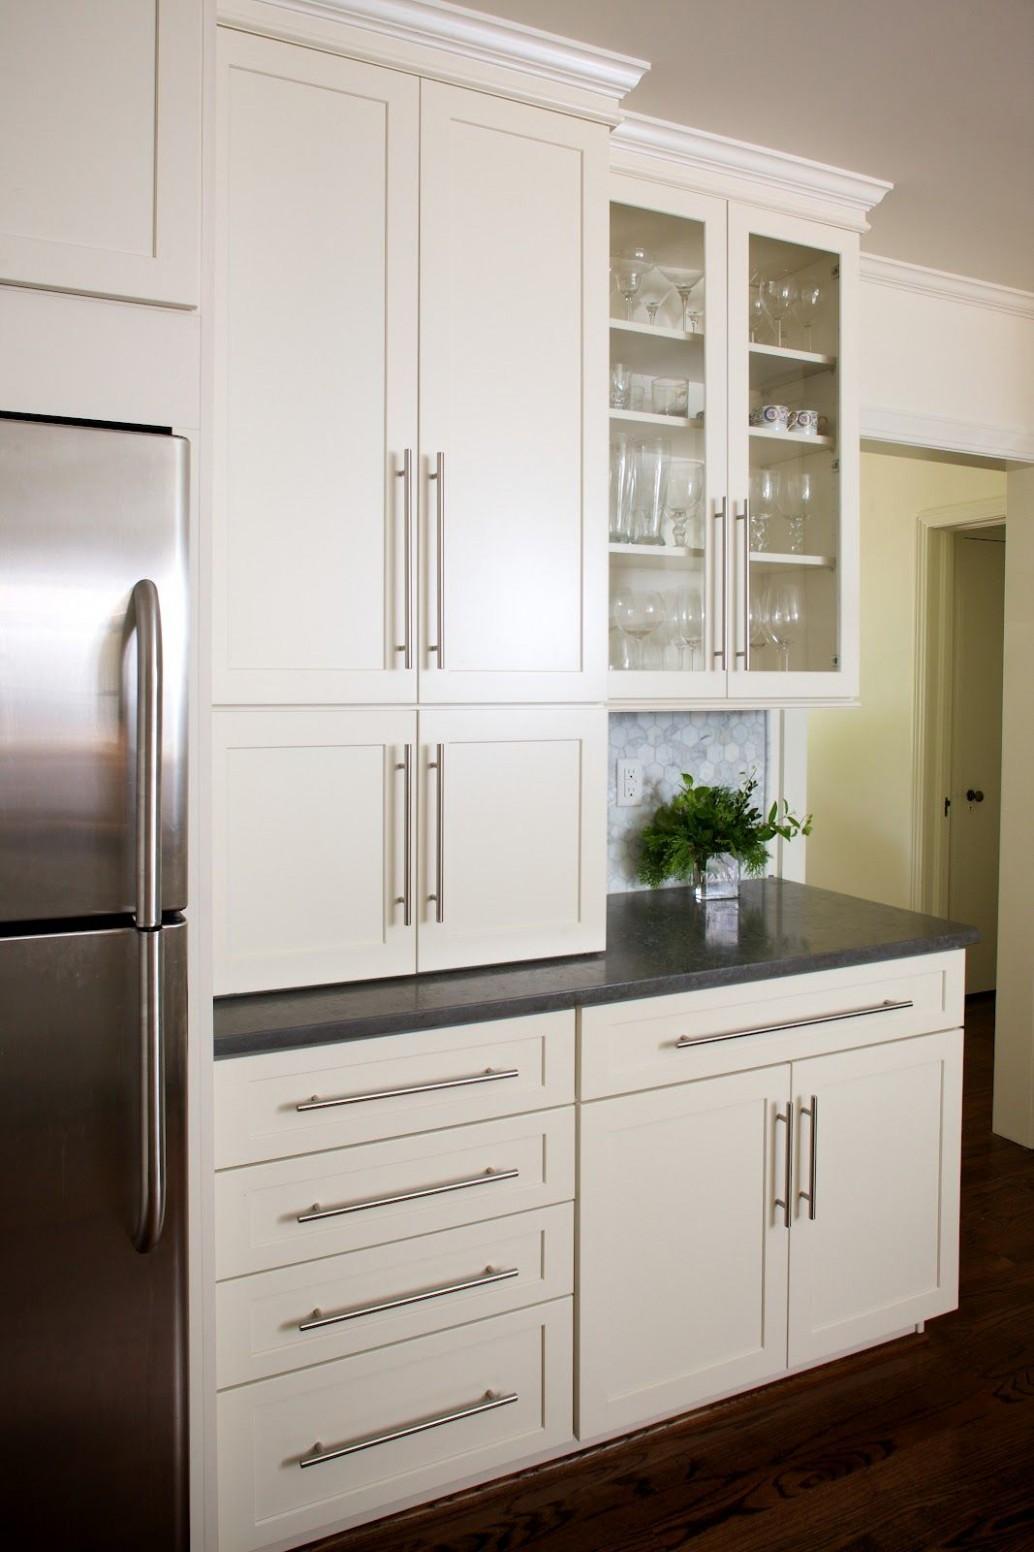 Haven and Home: August 12  White modern kitchen, White kitchen  - Long Cabinet Pulls Kitchen